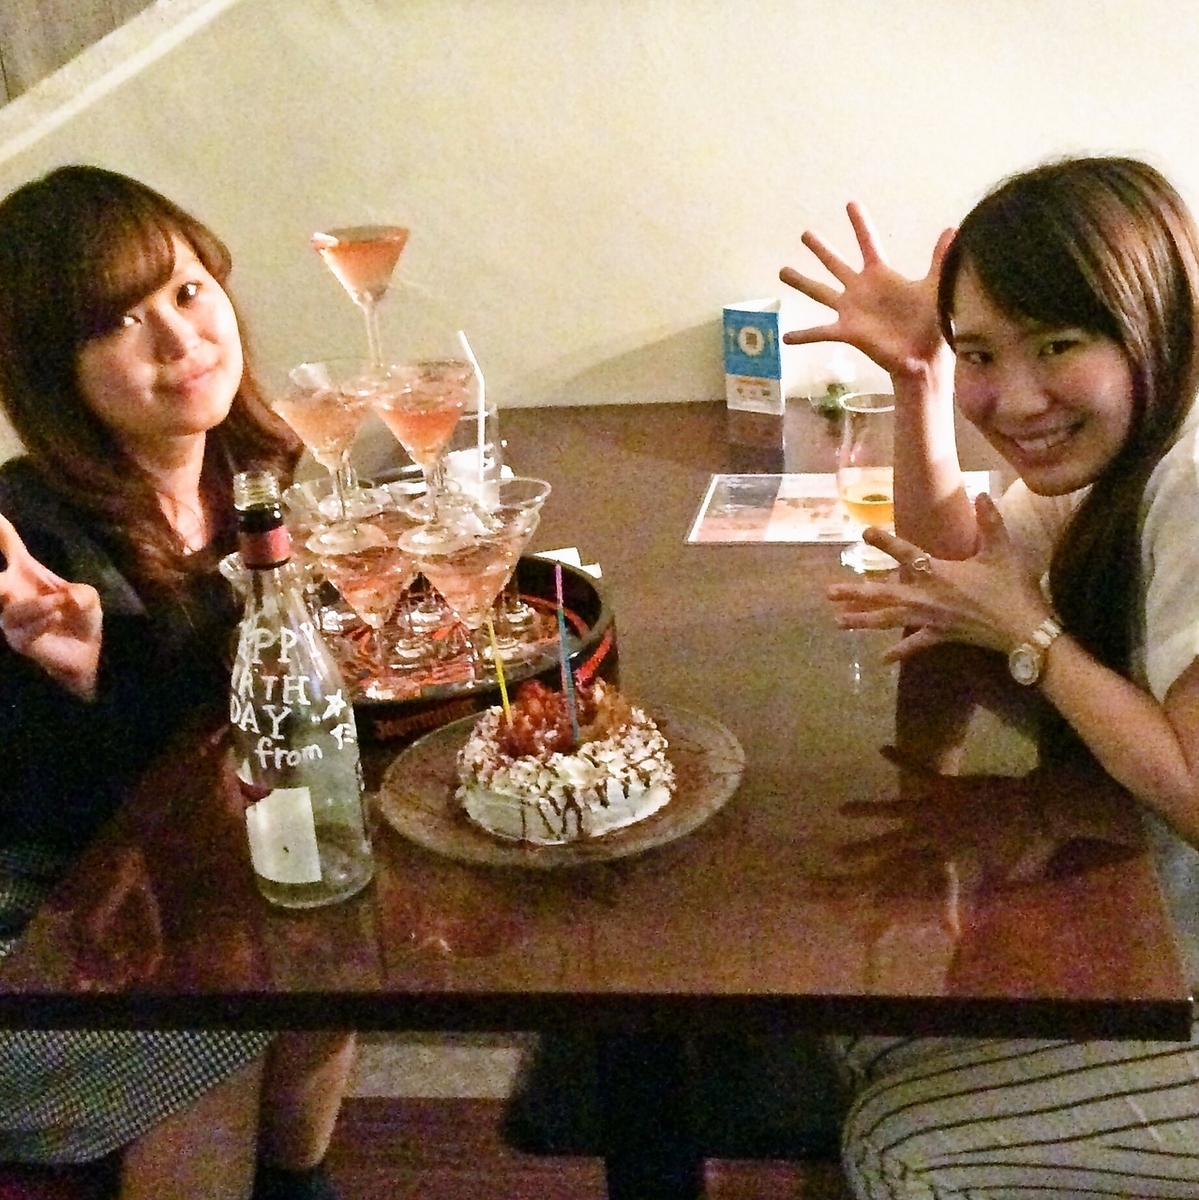 【Goodluck de Champagne Tower & Cake Birthday ♪】